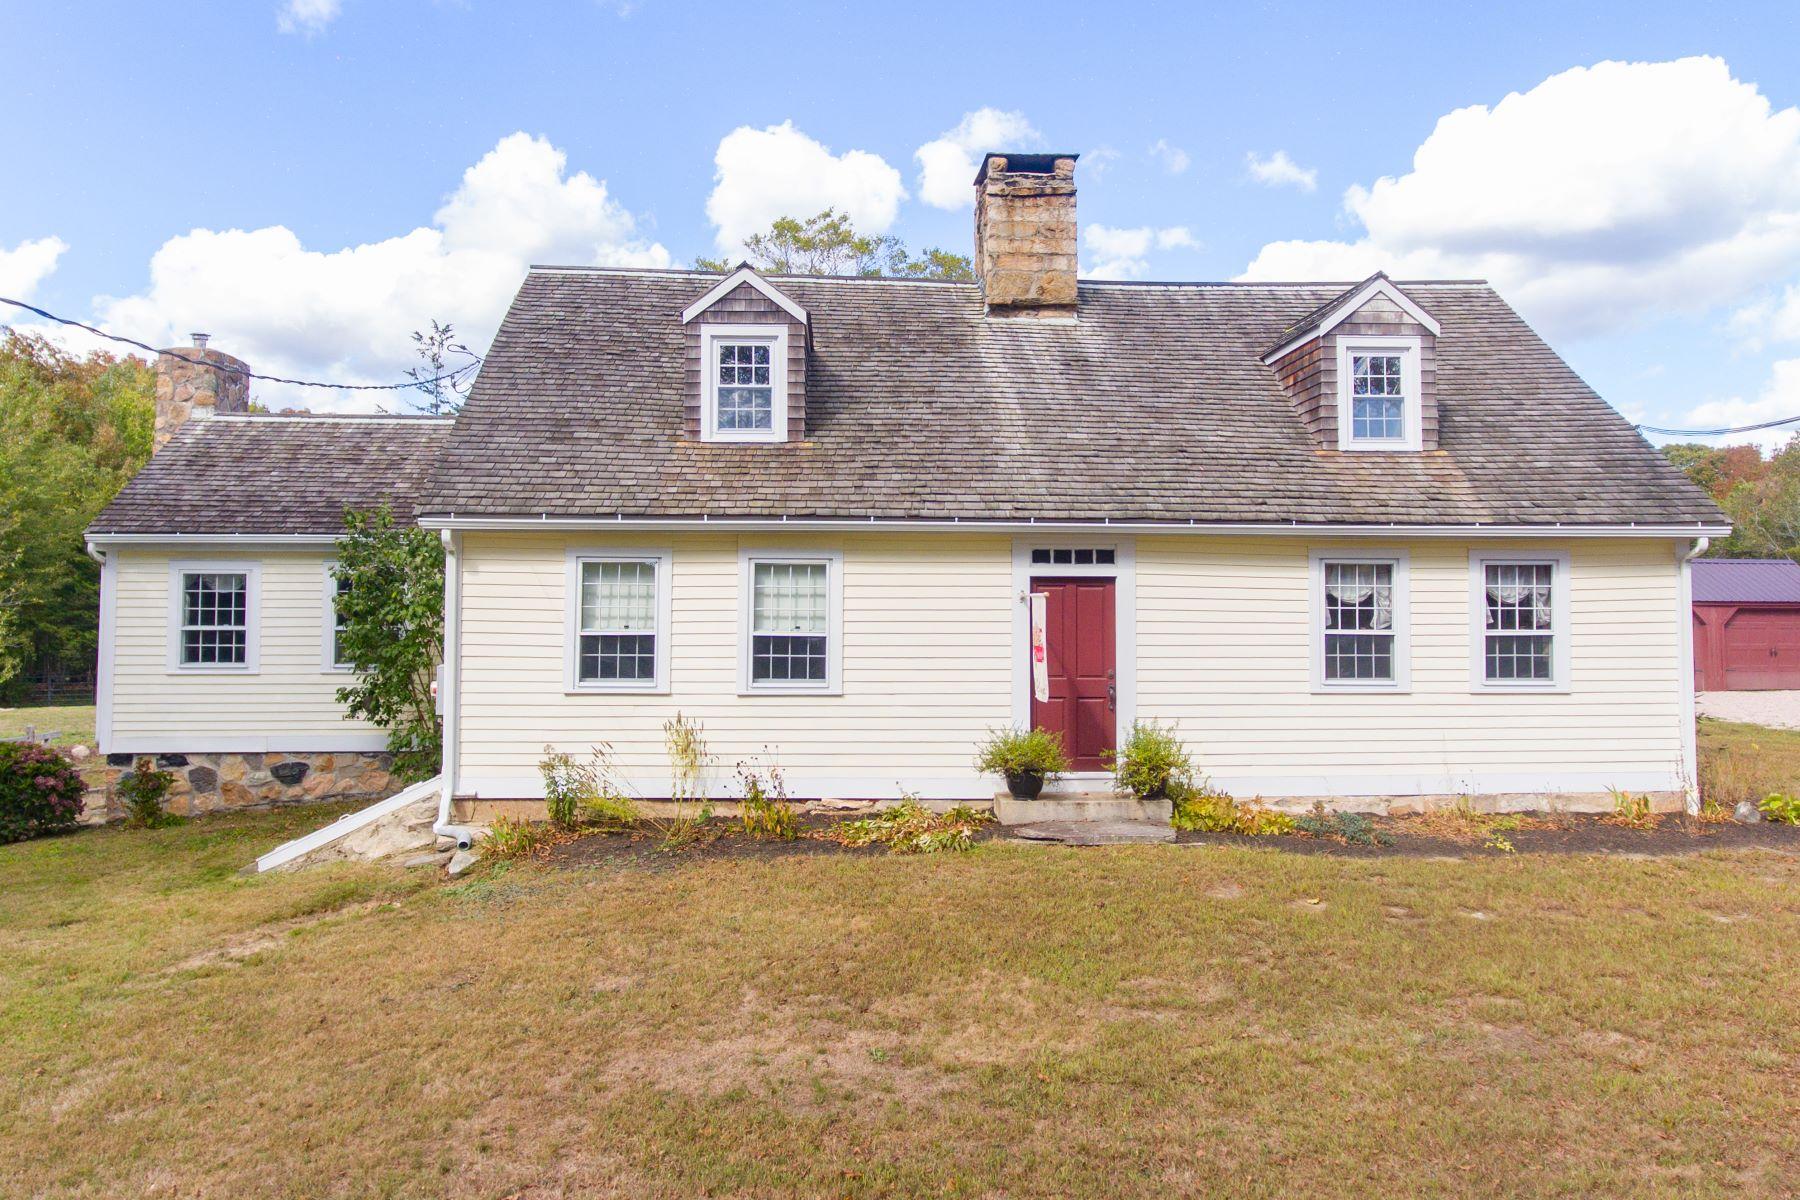 Single Family Homes 为 销售 在 Lovely 1750 Home 155 Reutemann Road 北斯通宁顿, 康涅狄格州 06359 美国